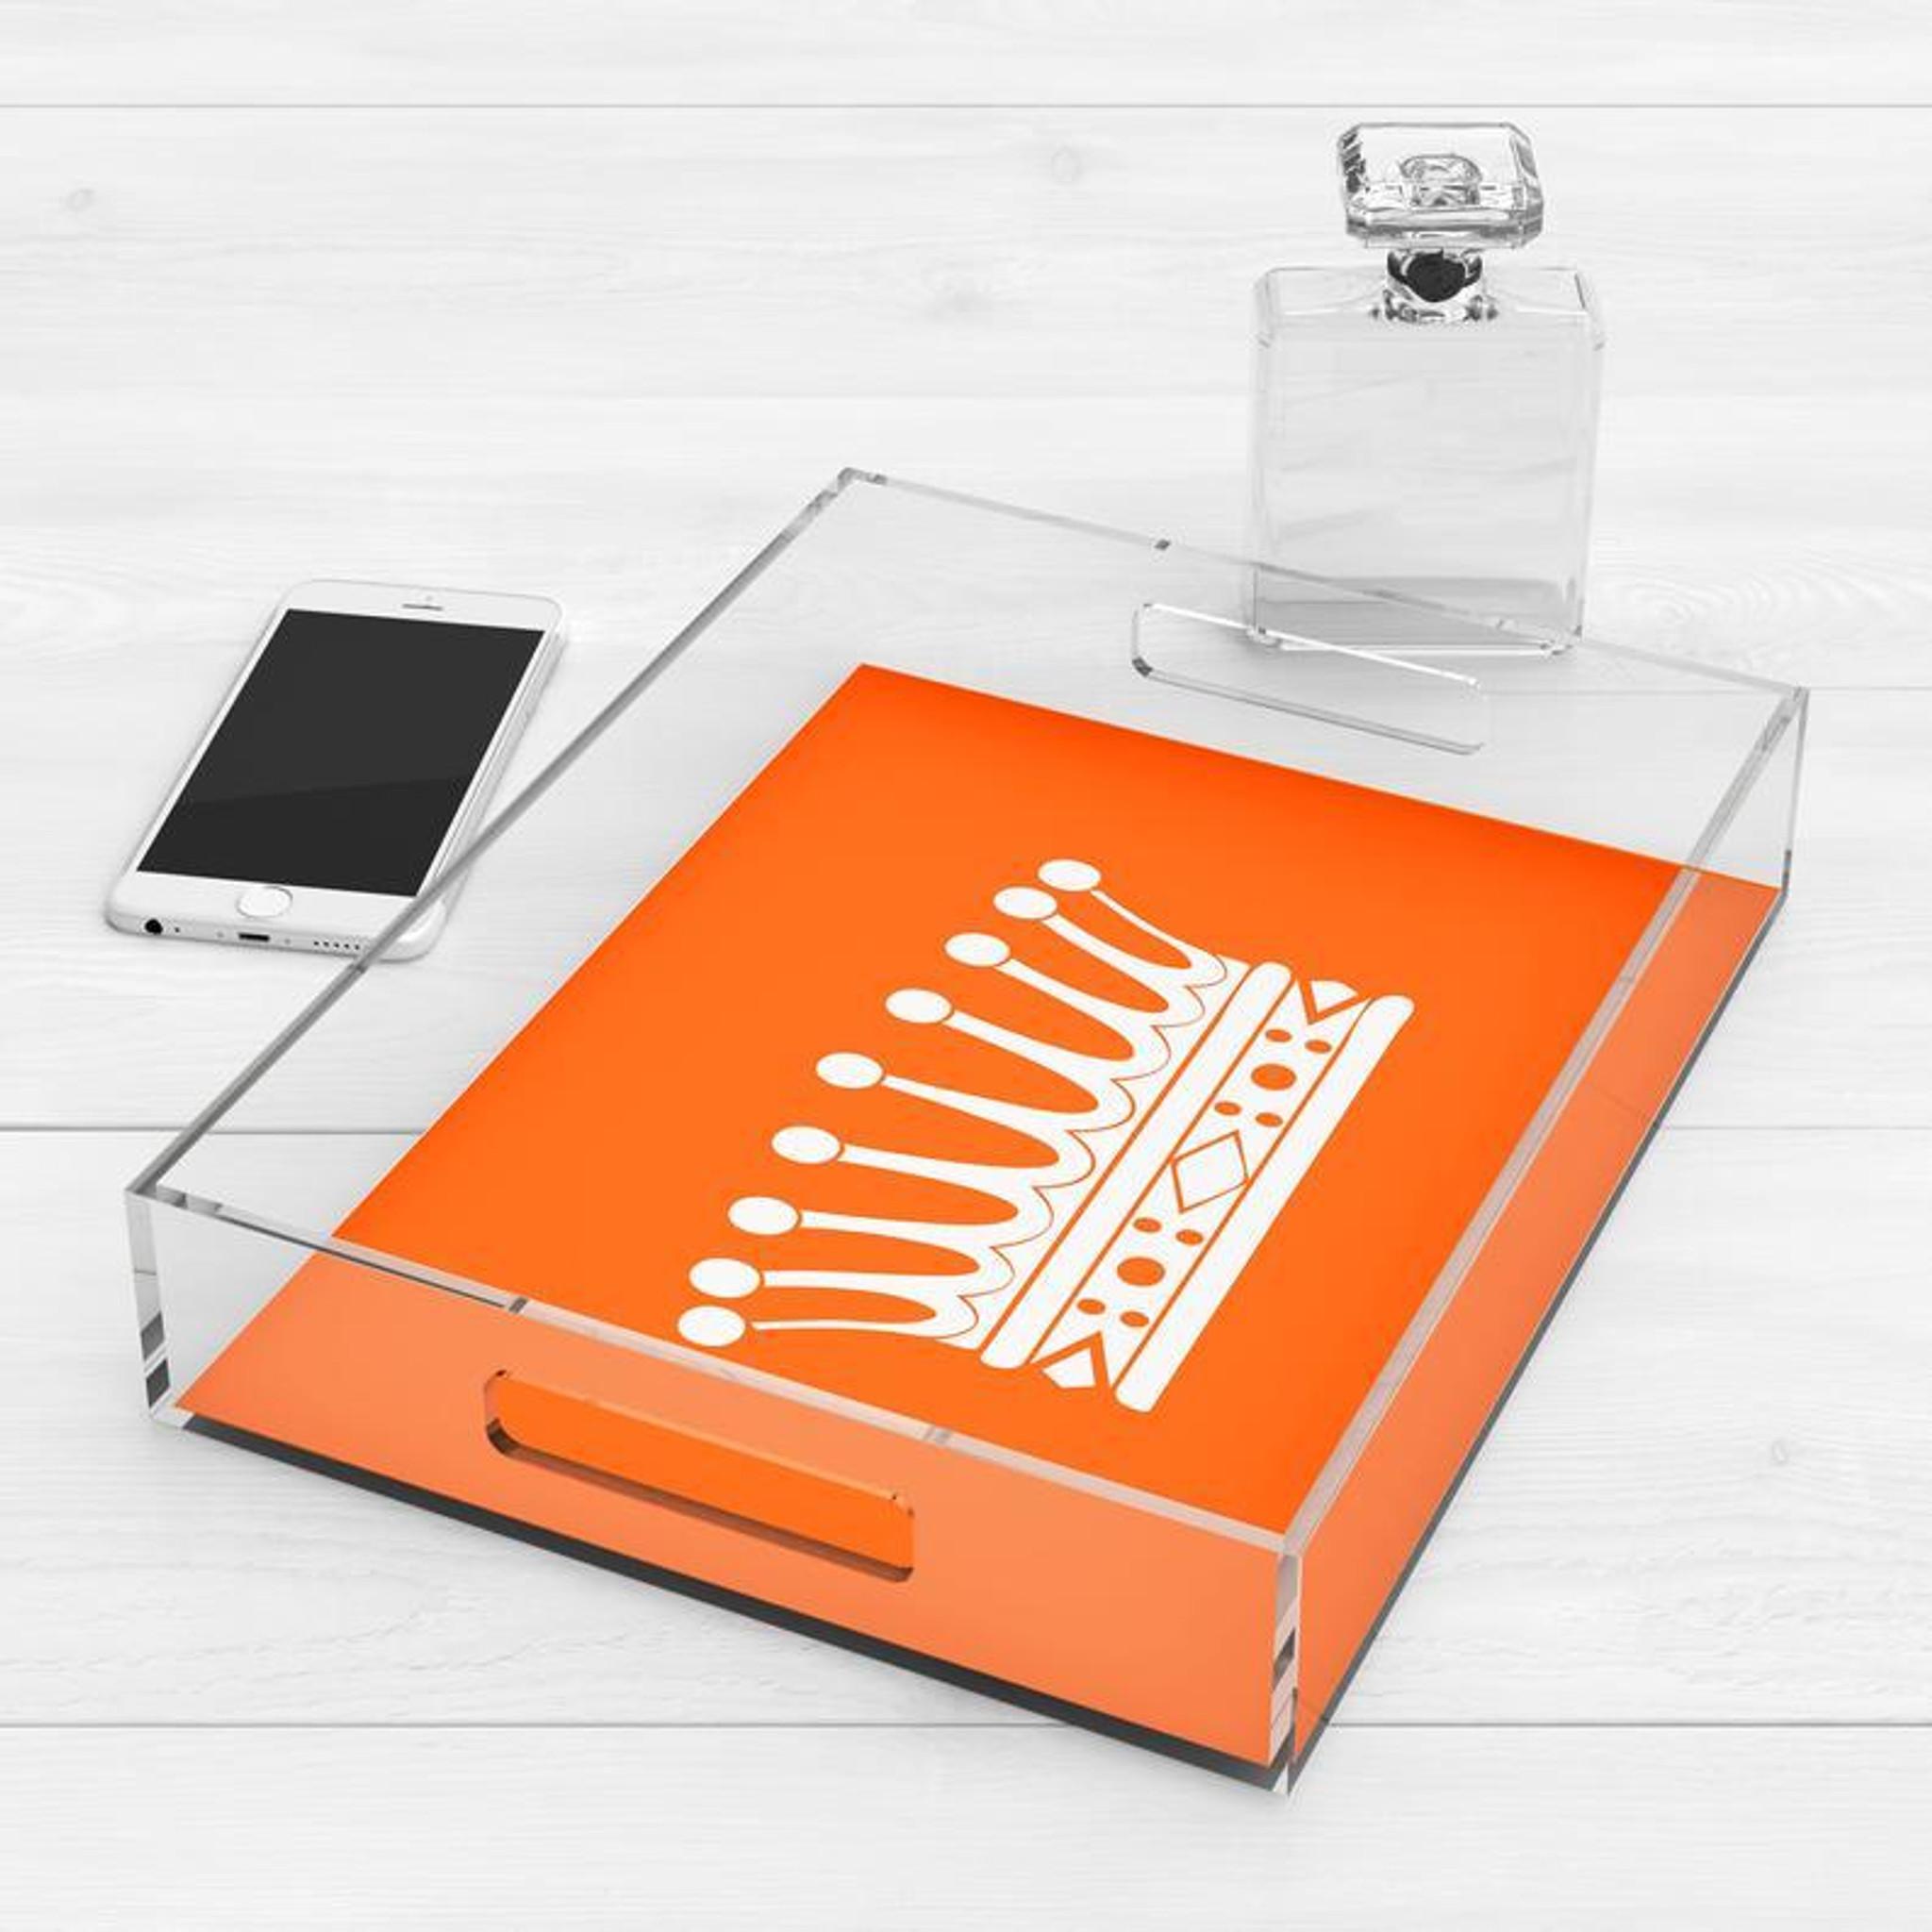 large acrylic serving decorative tray with handles bright orange crown princess design